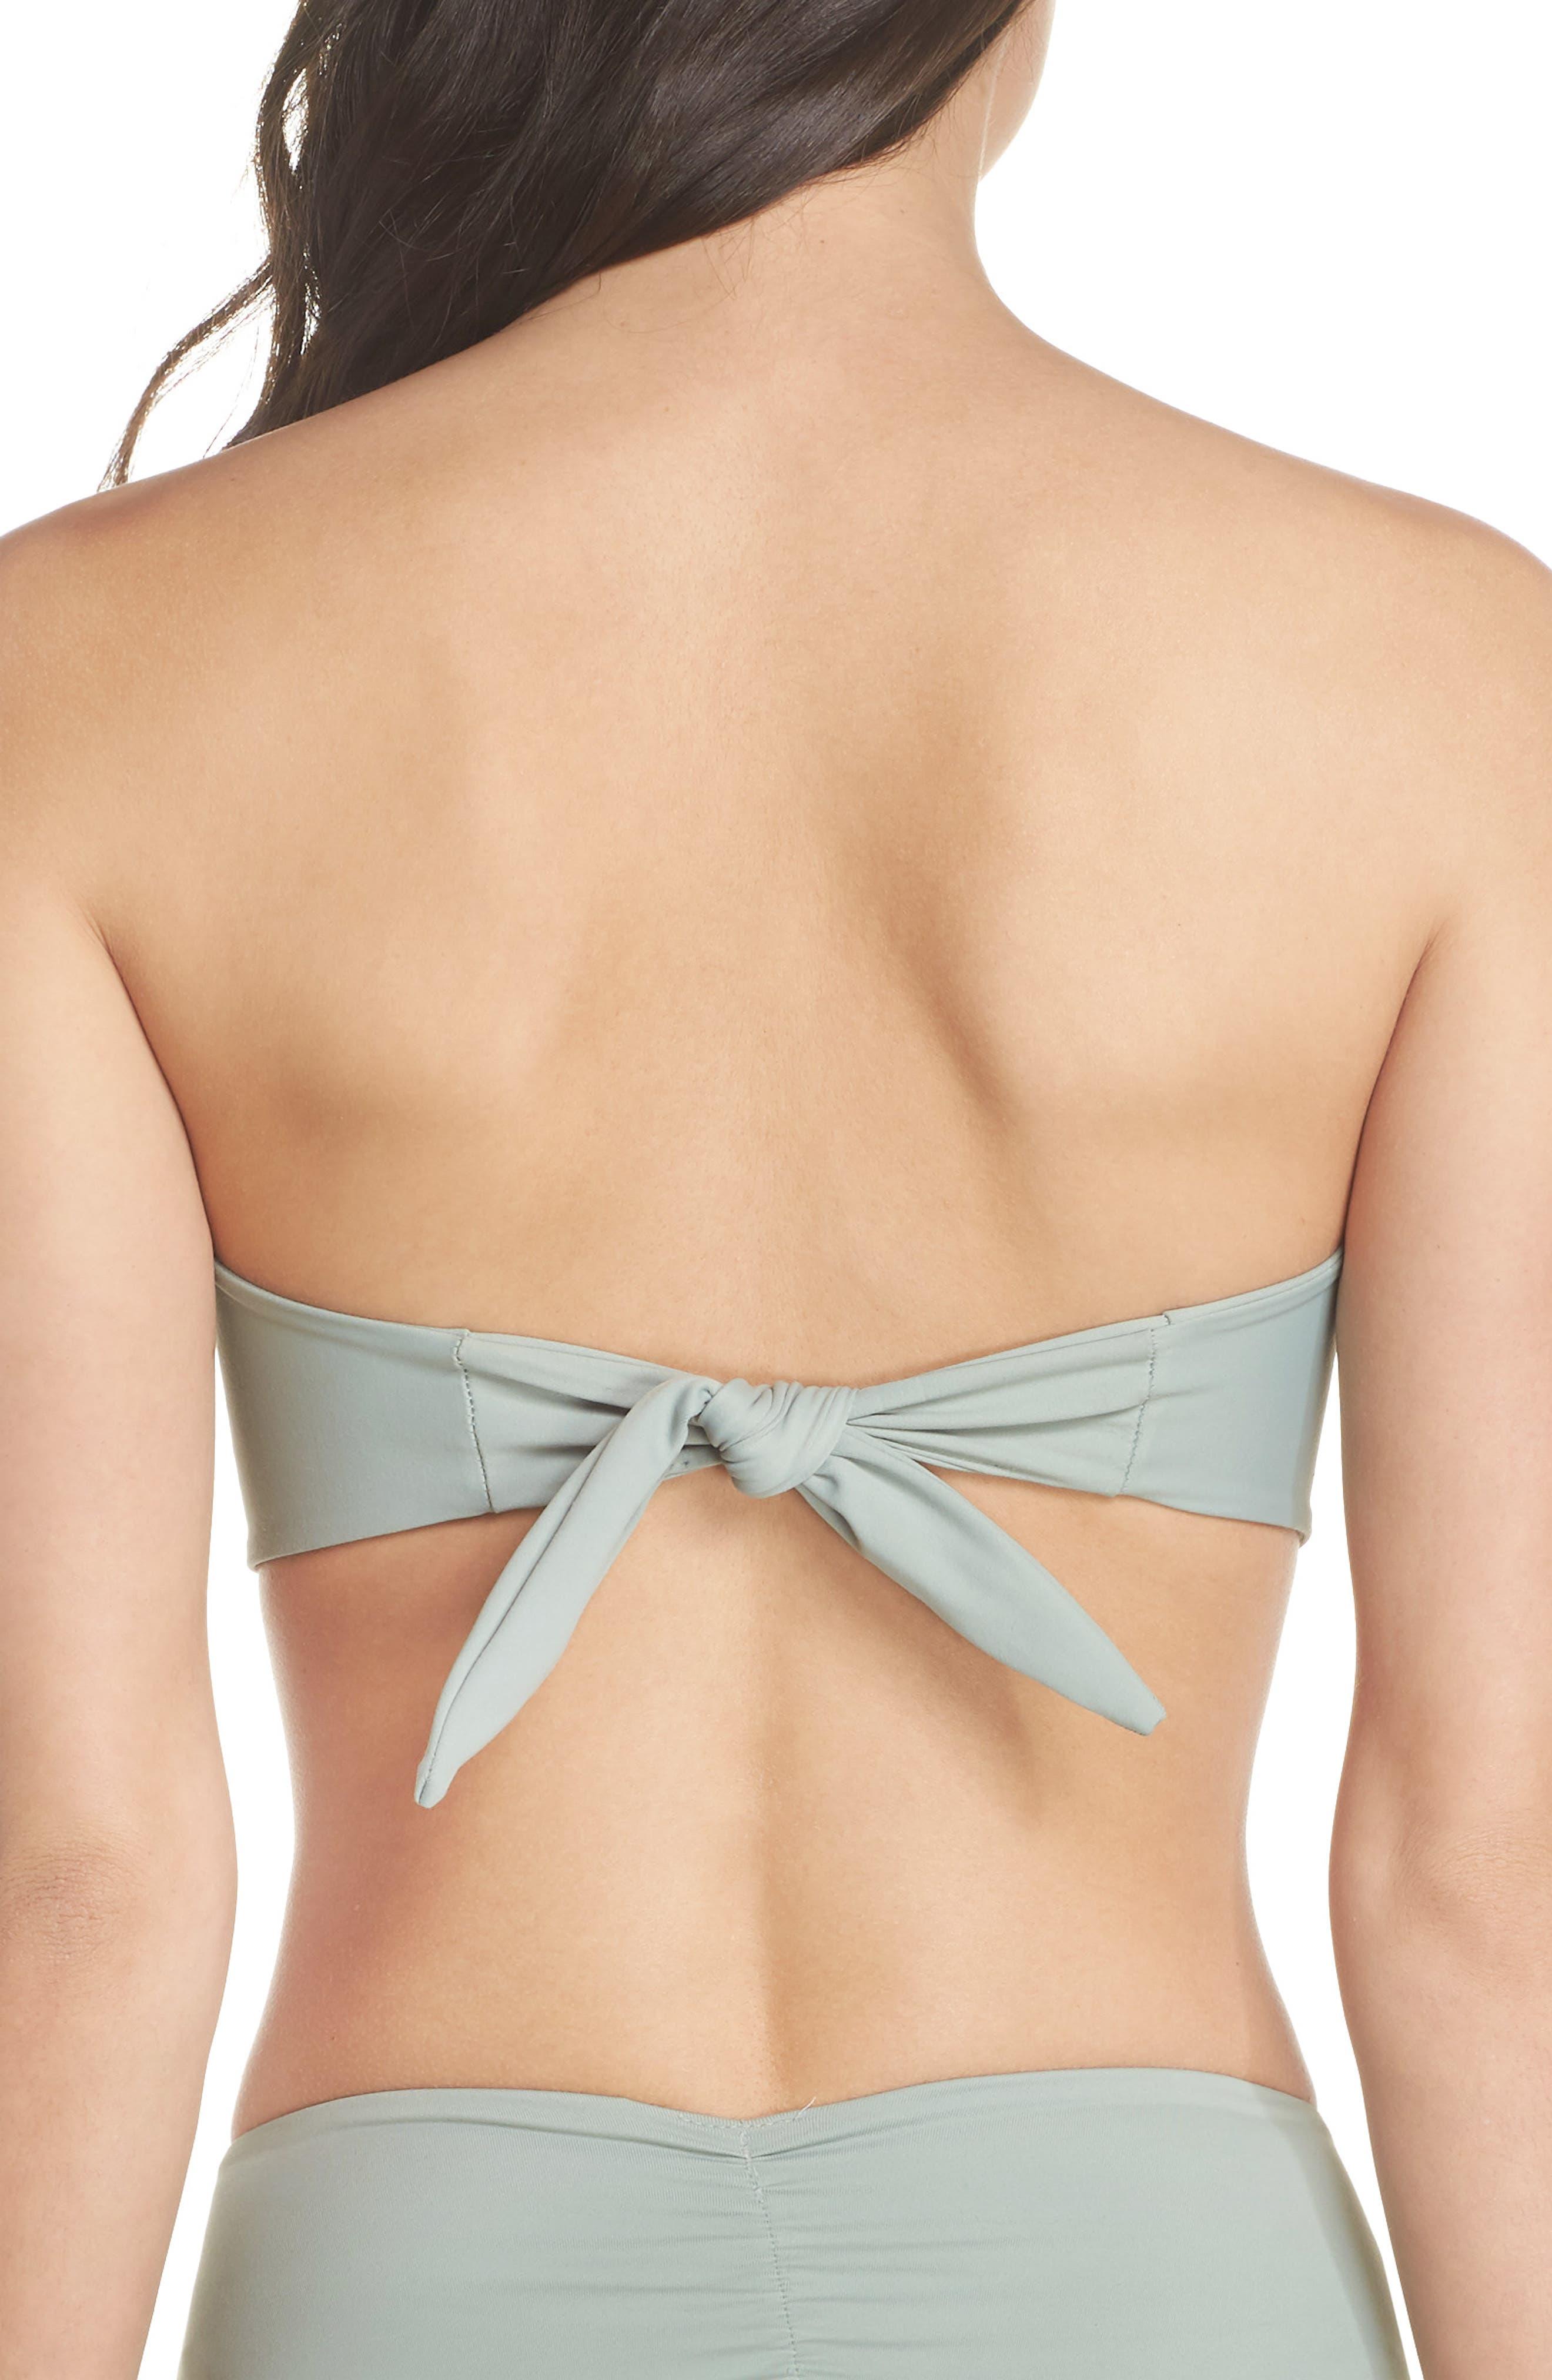 Cabana Bikini Top,                             Alternate thumbnail 3, color,                             PISTACHE GREEN